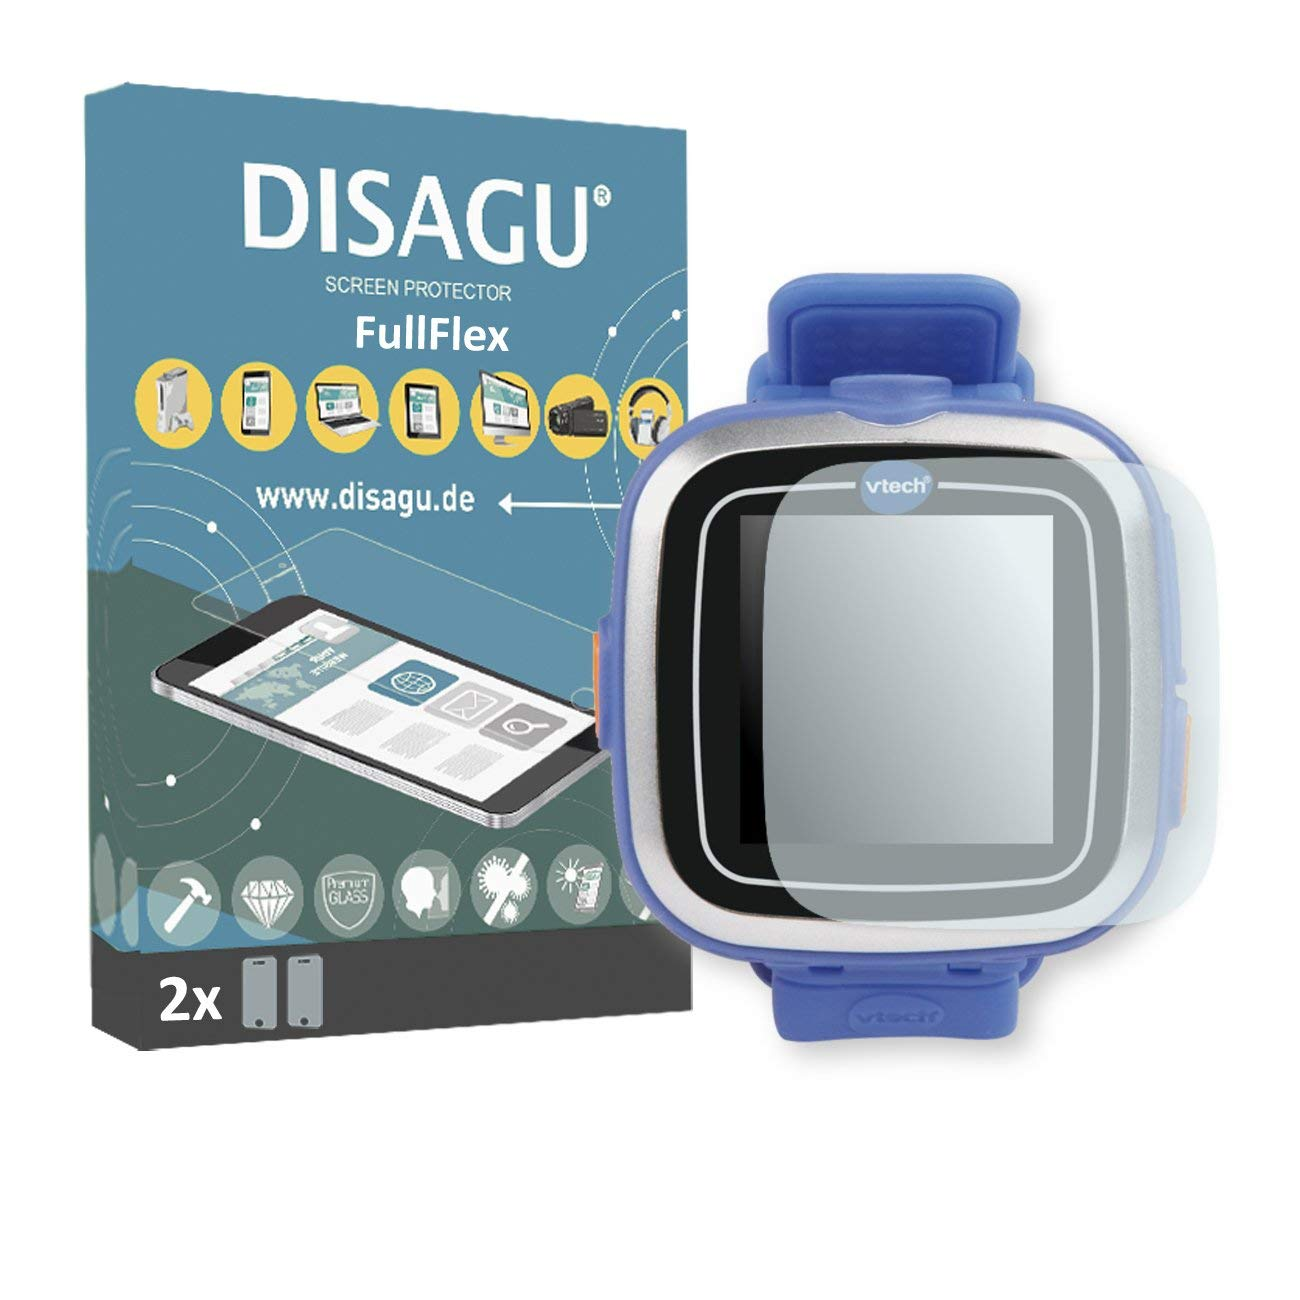 DISAGU 2 x FullFlex screen protector for Vtech Kidizoom Smart Watch 1 foil screen protector